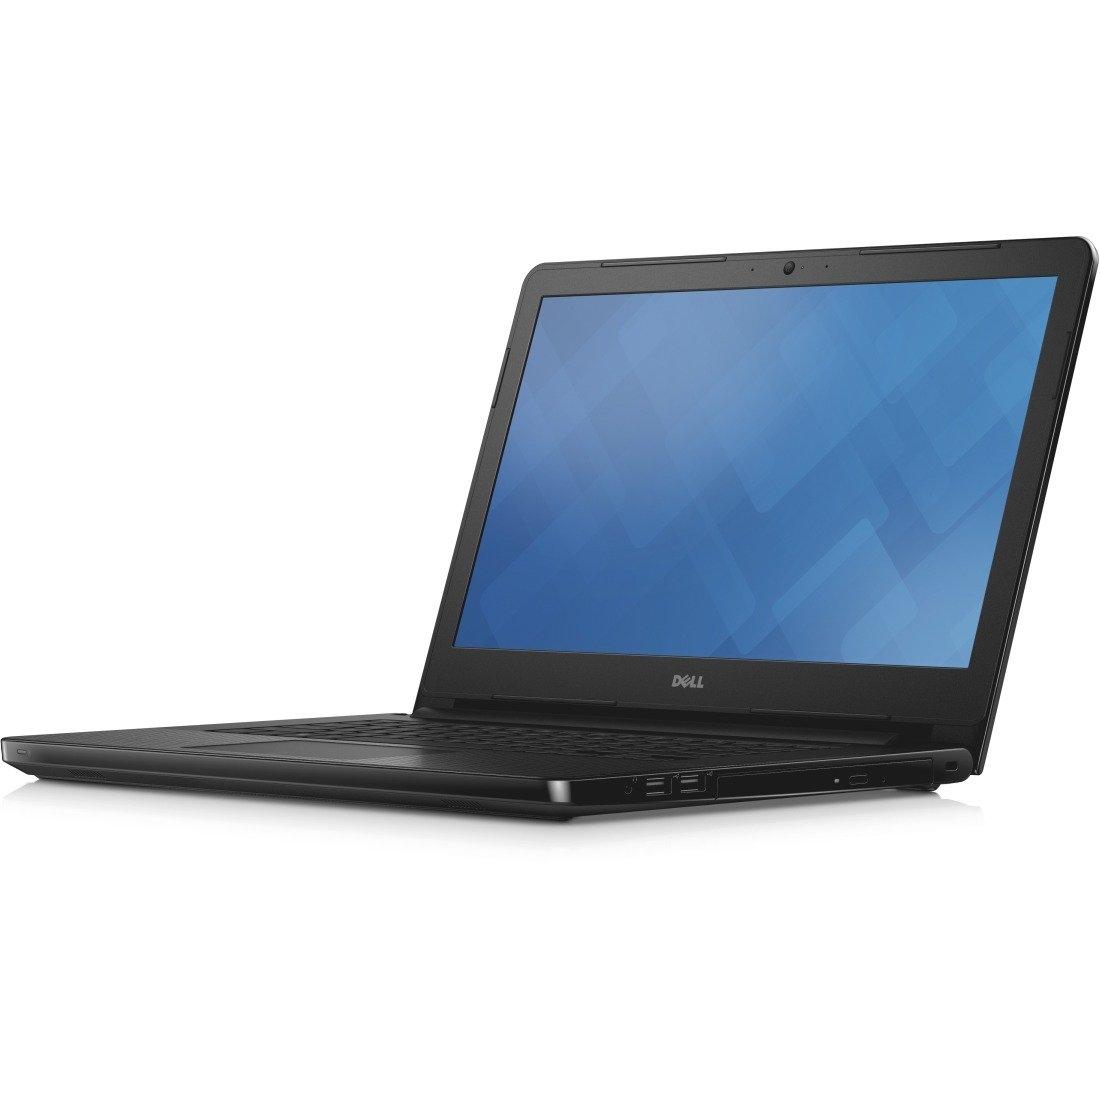 Dell Vostro 14 3000 Laptop